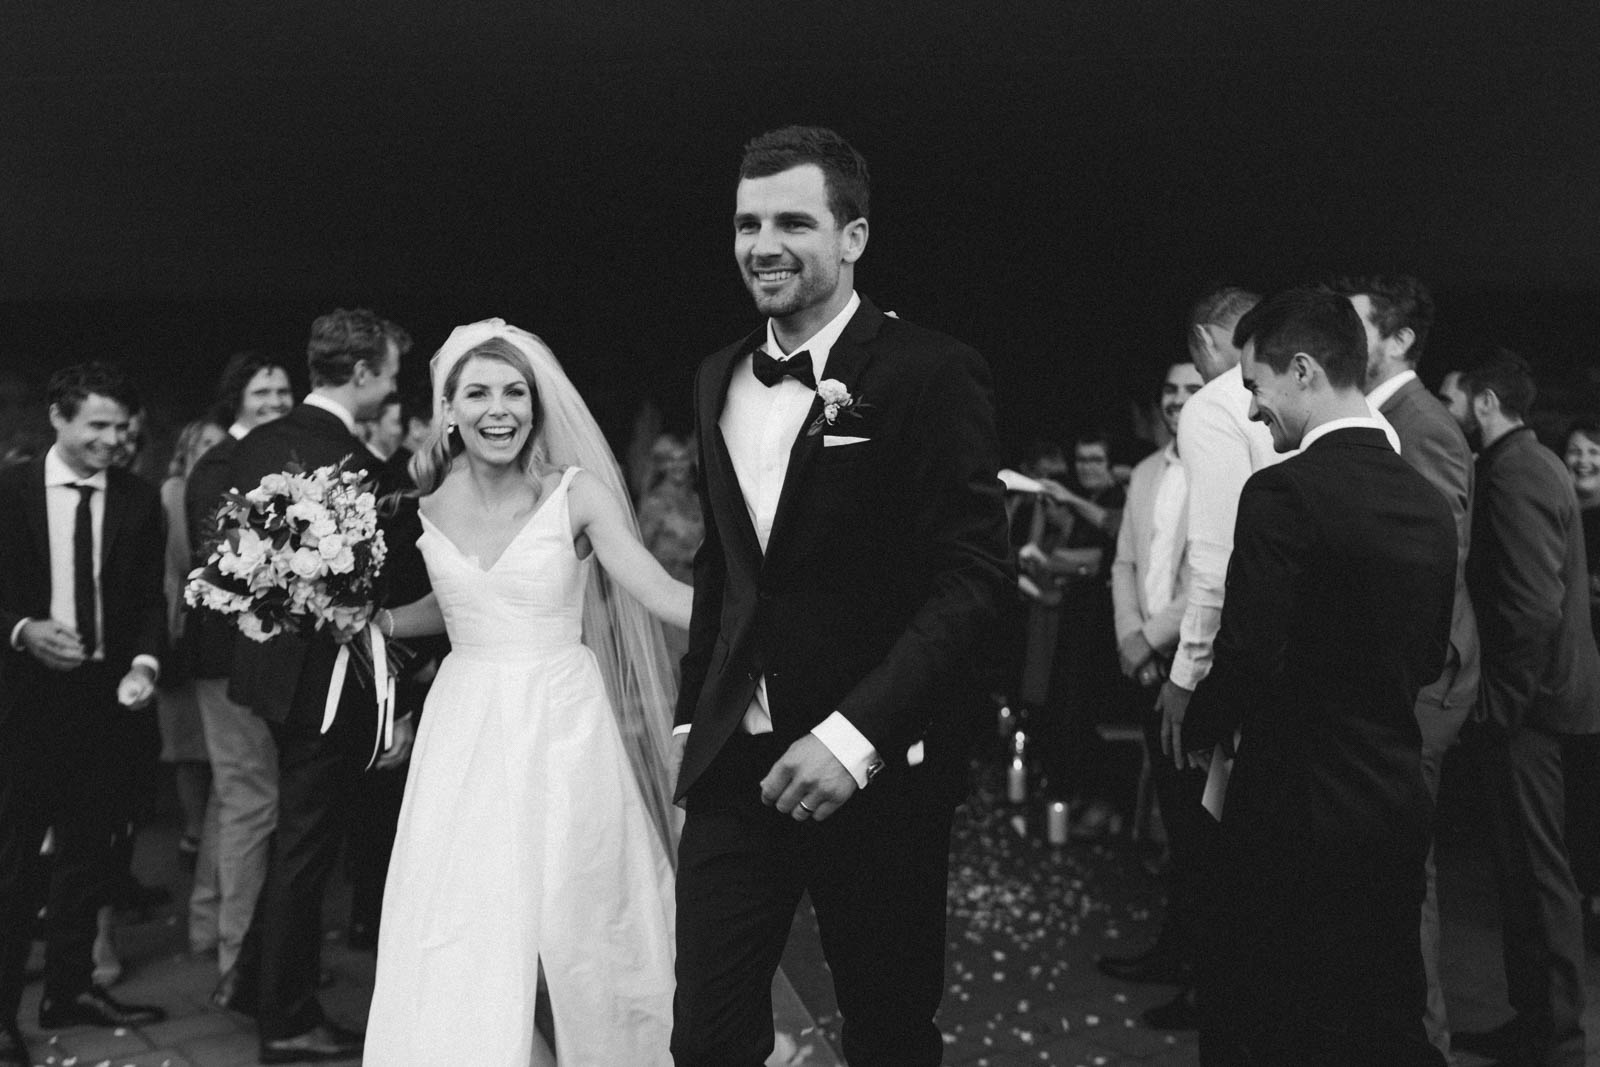 newfound-s-p-mt-maunganui-tauranga-wedding-photographer-1718-A9_06693